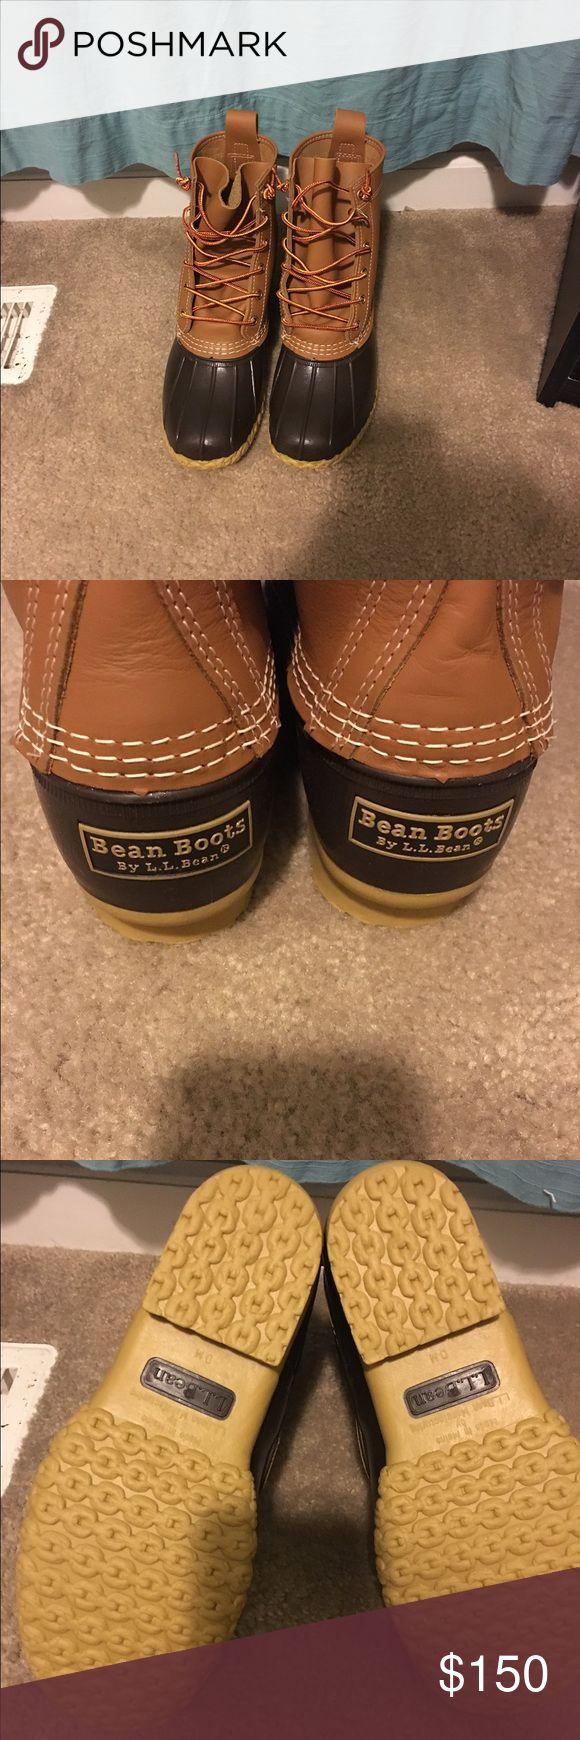 "BRAND NEW Women's Bean Boots by L.L.Bean®, 8"". BRAND NEW Women's Bean Boots by L.L.Bean®, 8"". NEVER BEEN WORN. Brown L.L. Bean Shoes Winter & Rain Boots"